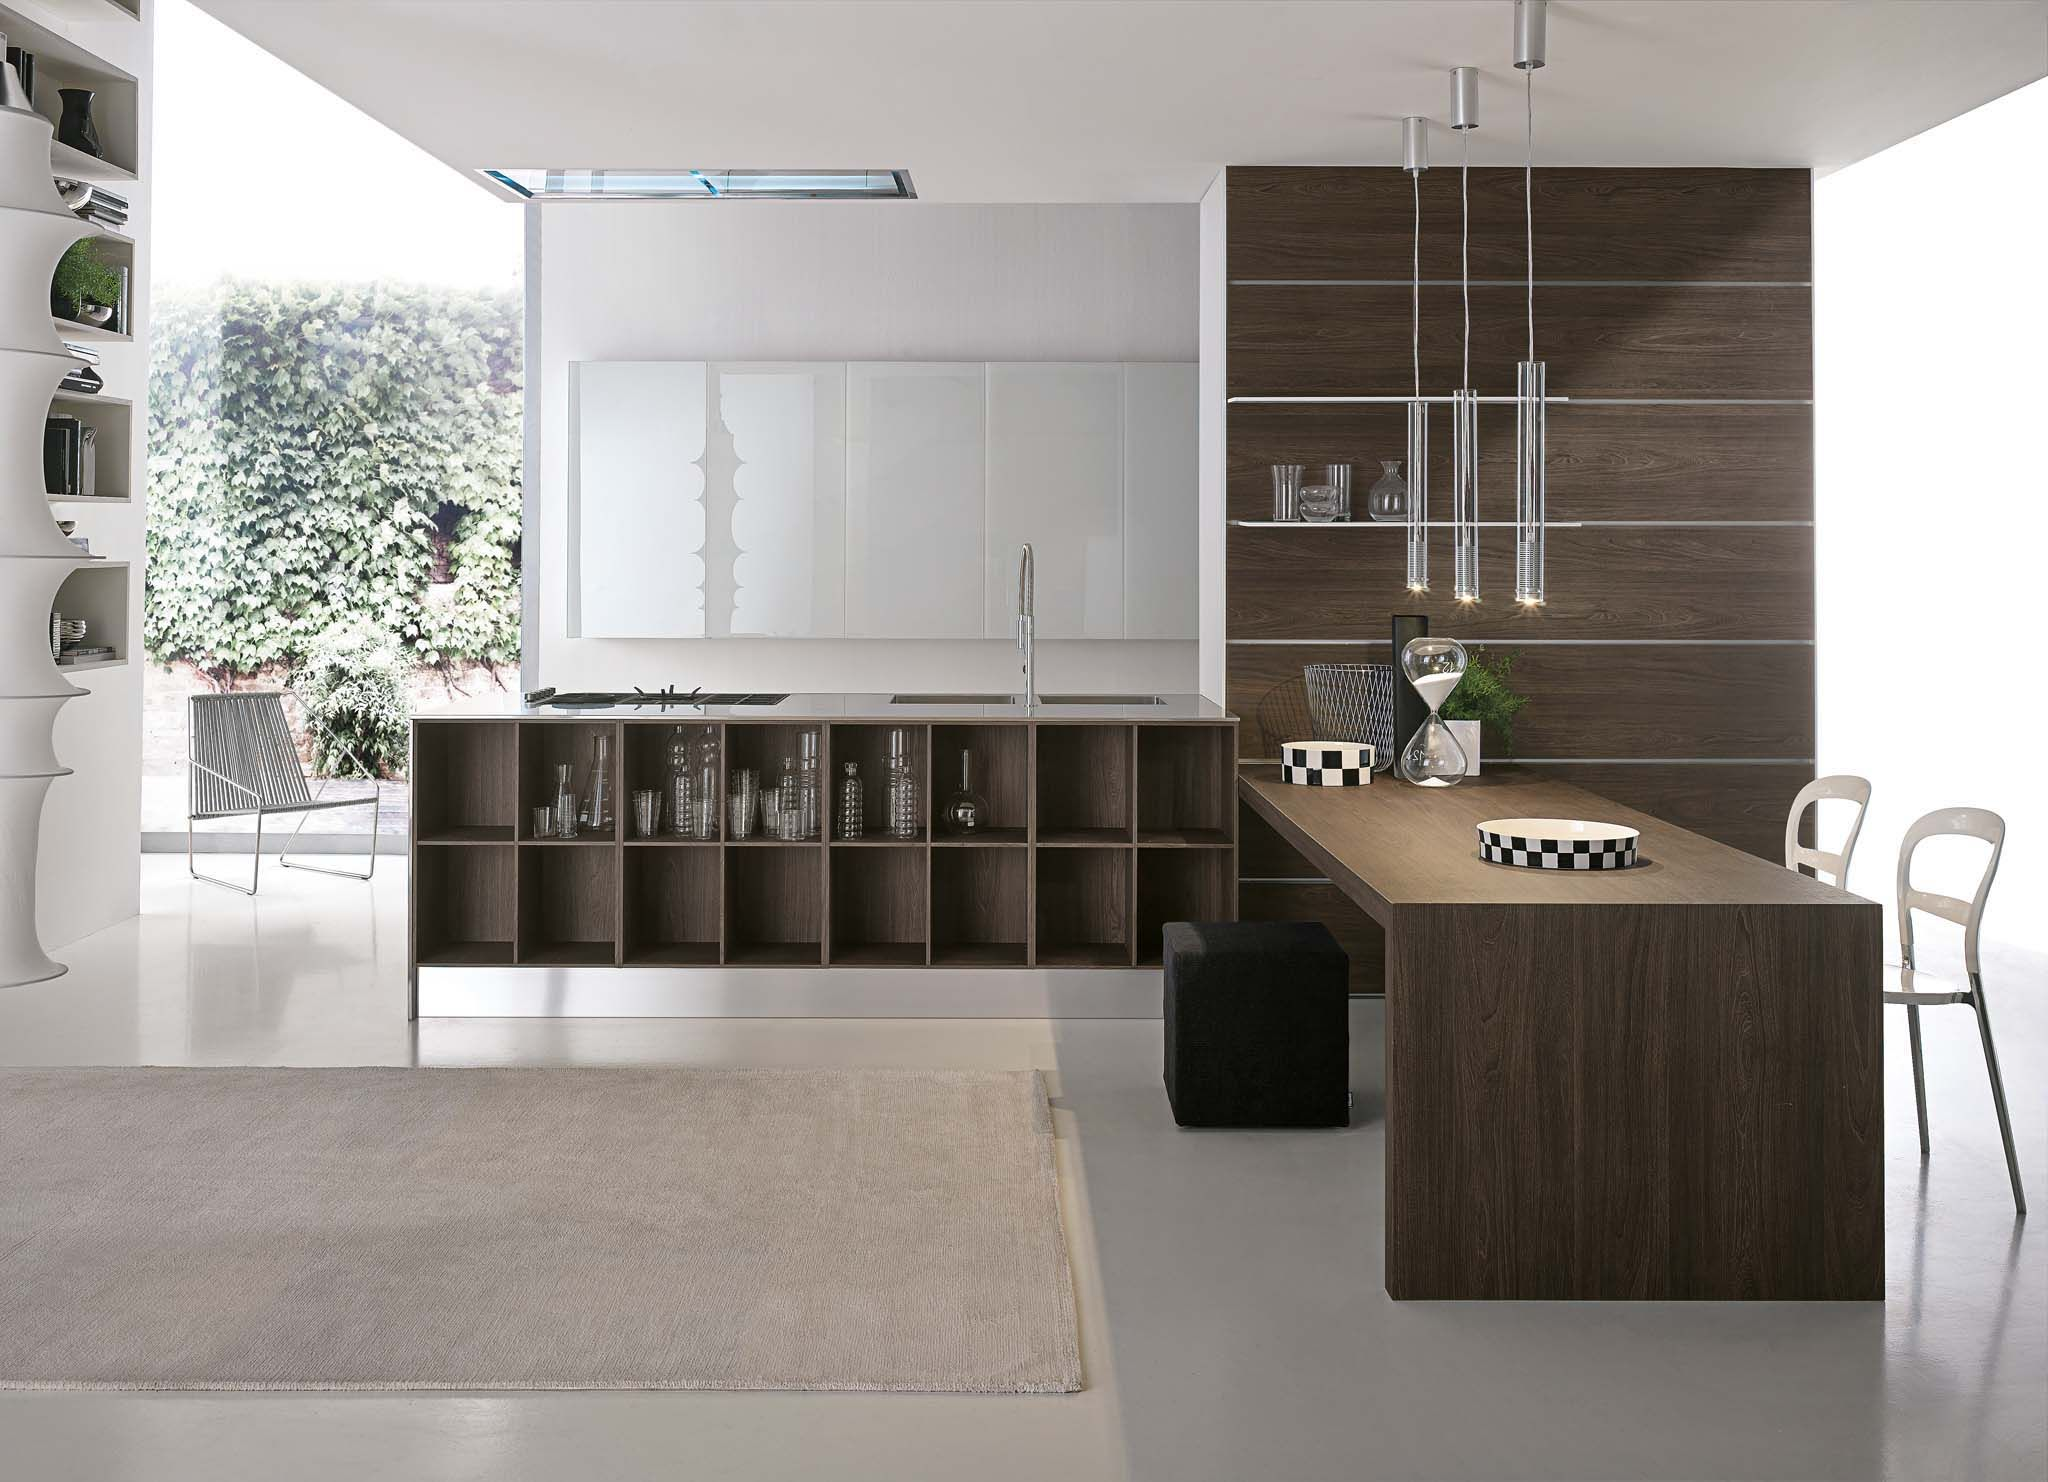 Aster Cucine A Leading Italian Manufacturer For Modern Kitchen Cabinets Modern Kitchen Design Contemporary Kitchen Cabinets Kitchen Cabinets Showroom